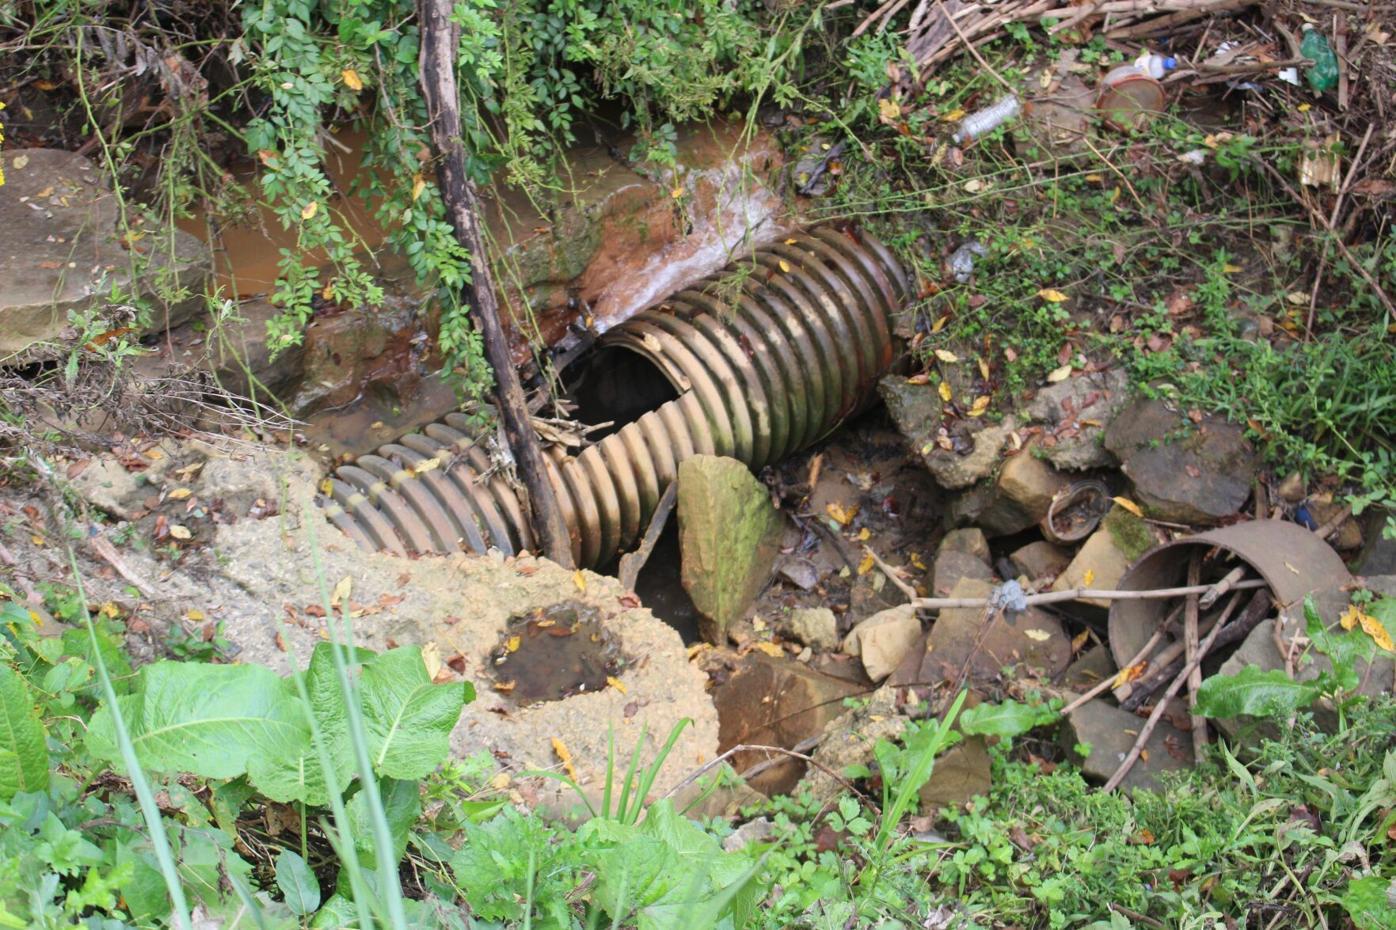 Tunnelton ditch flooding risk